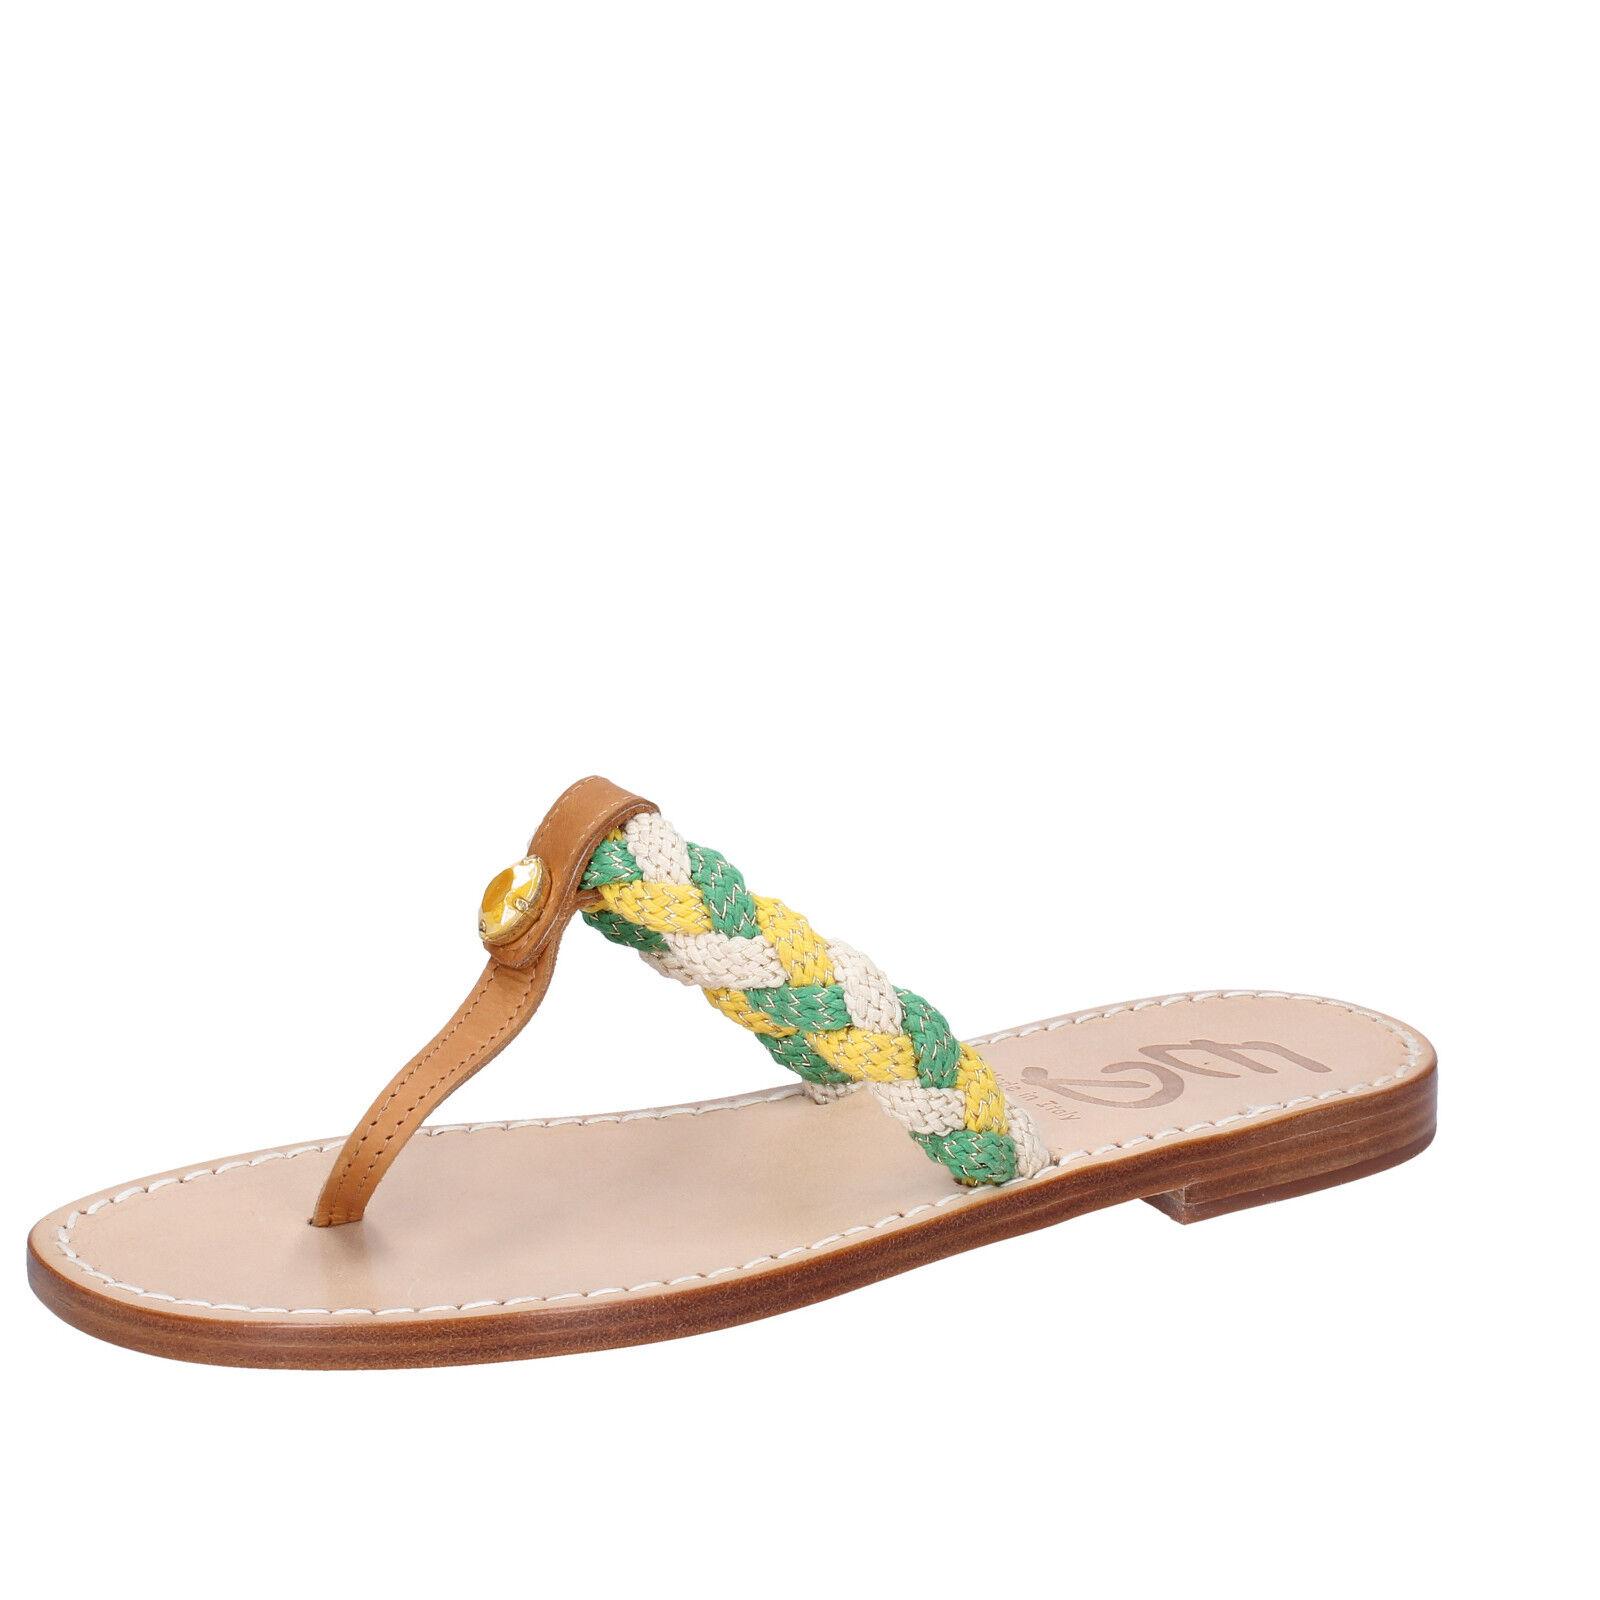 Damens's schuhe EDDY DANIELE 7 (EU 37) Sandale multicolor rope Leder AX790